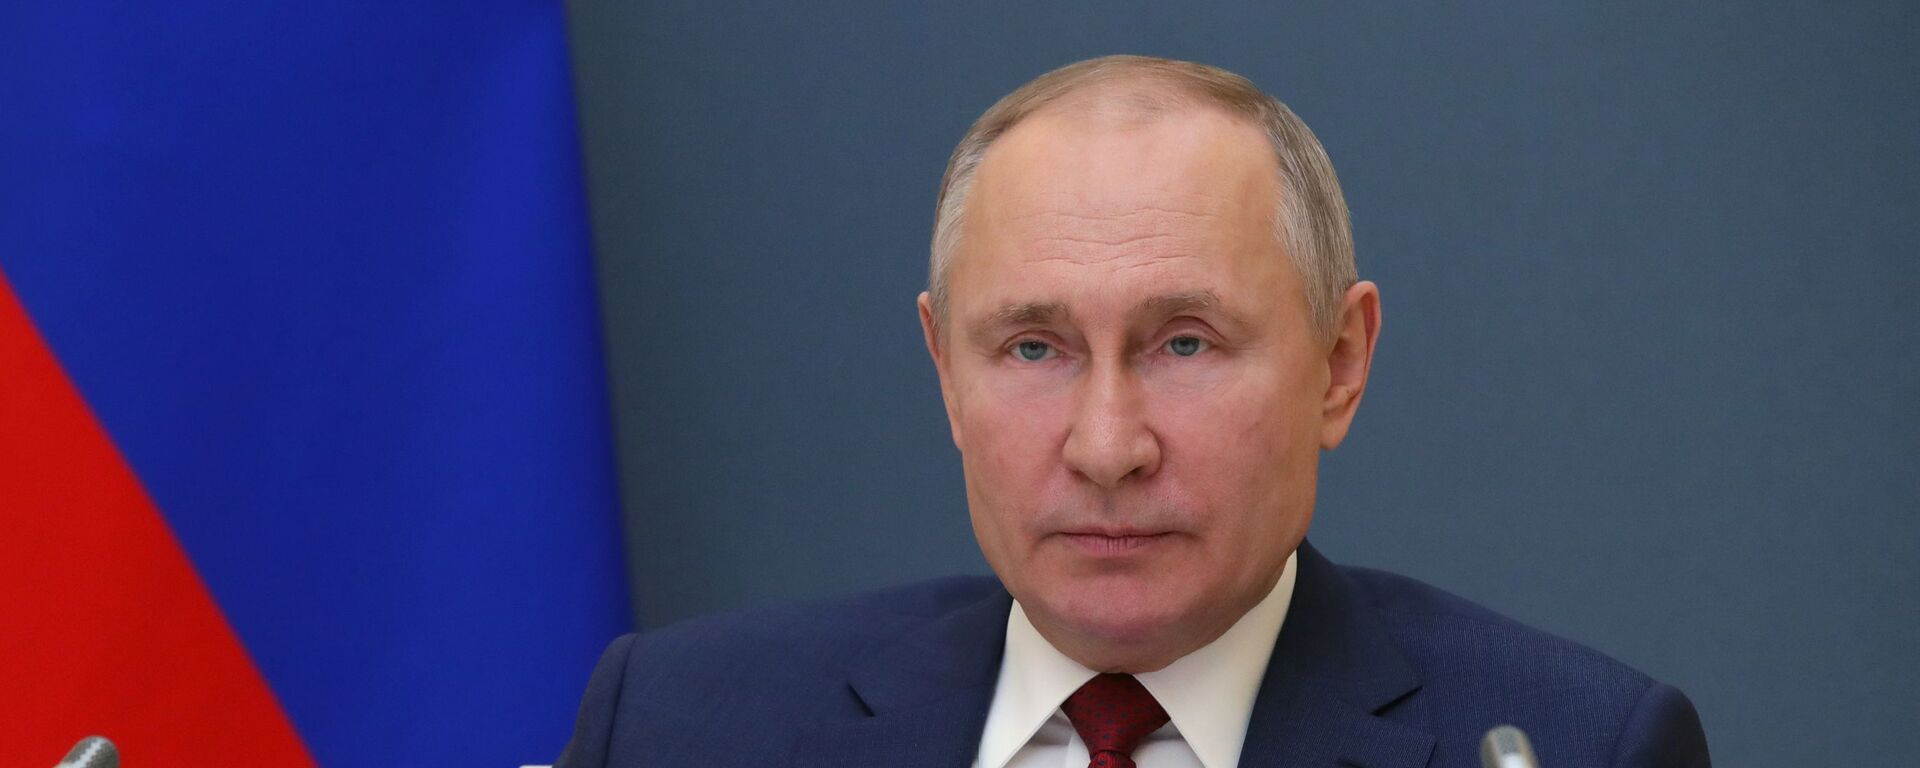 Russian President Vladimir Putin addresses the participants of the World Economic Forum's annual meeting in Davos on 27 January 2021 - Sputnik Italia, 1920, 21.03.2021